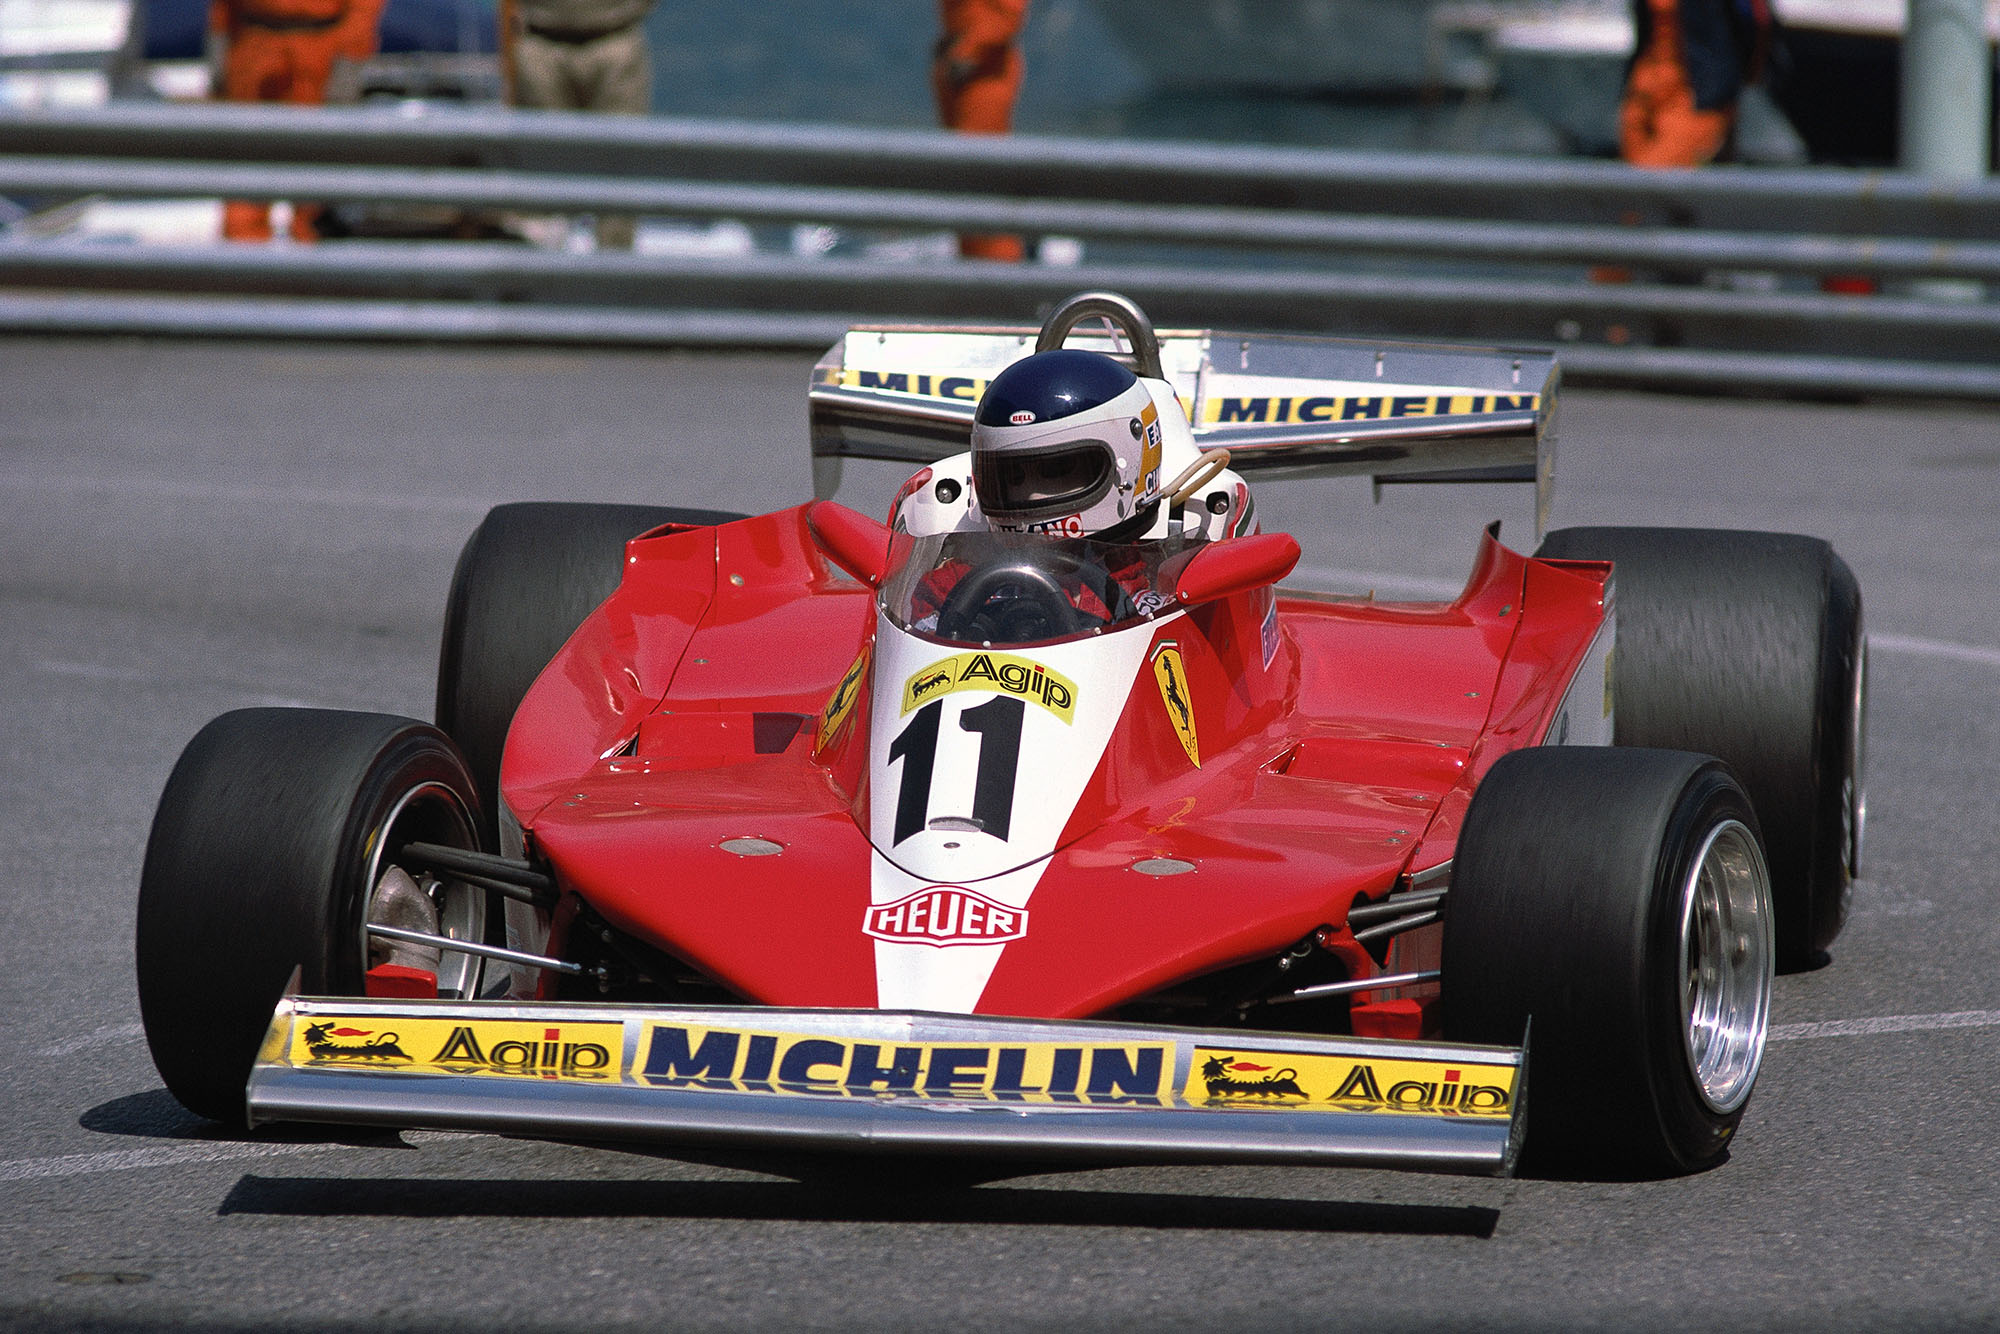 Carlos Reutemann (Ferrari) at the 1978 Monaco Grand Prix.